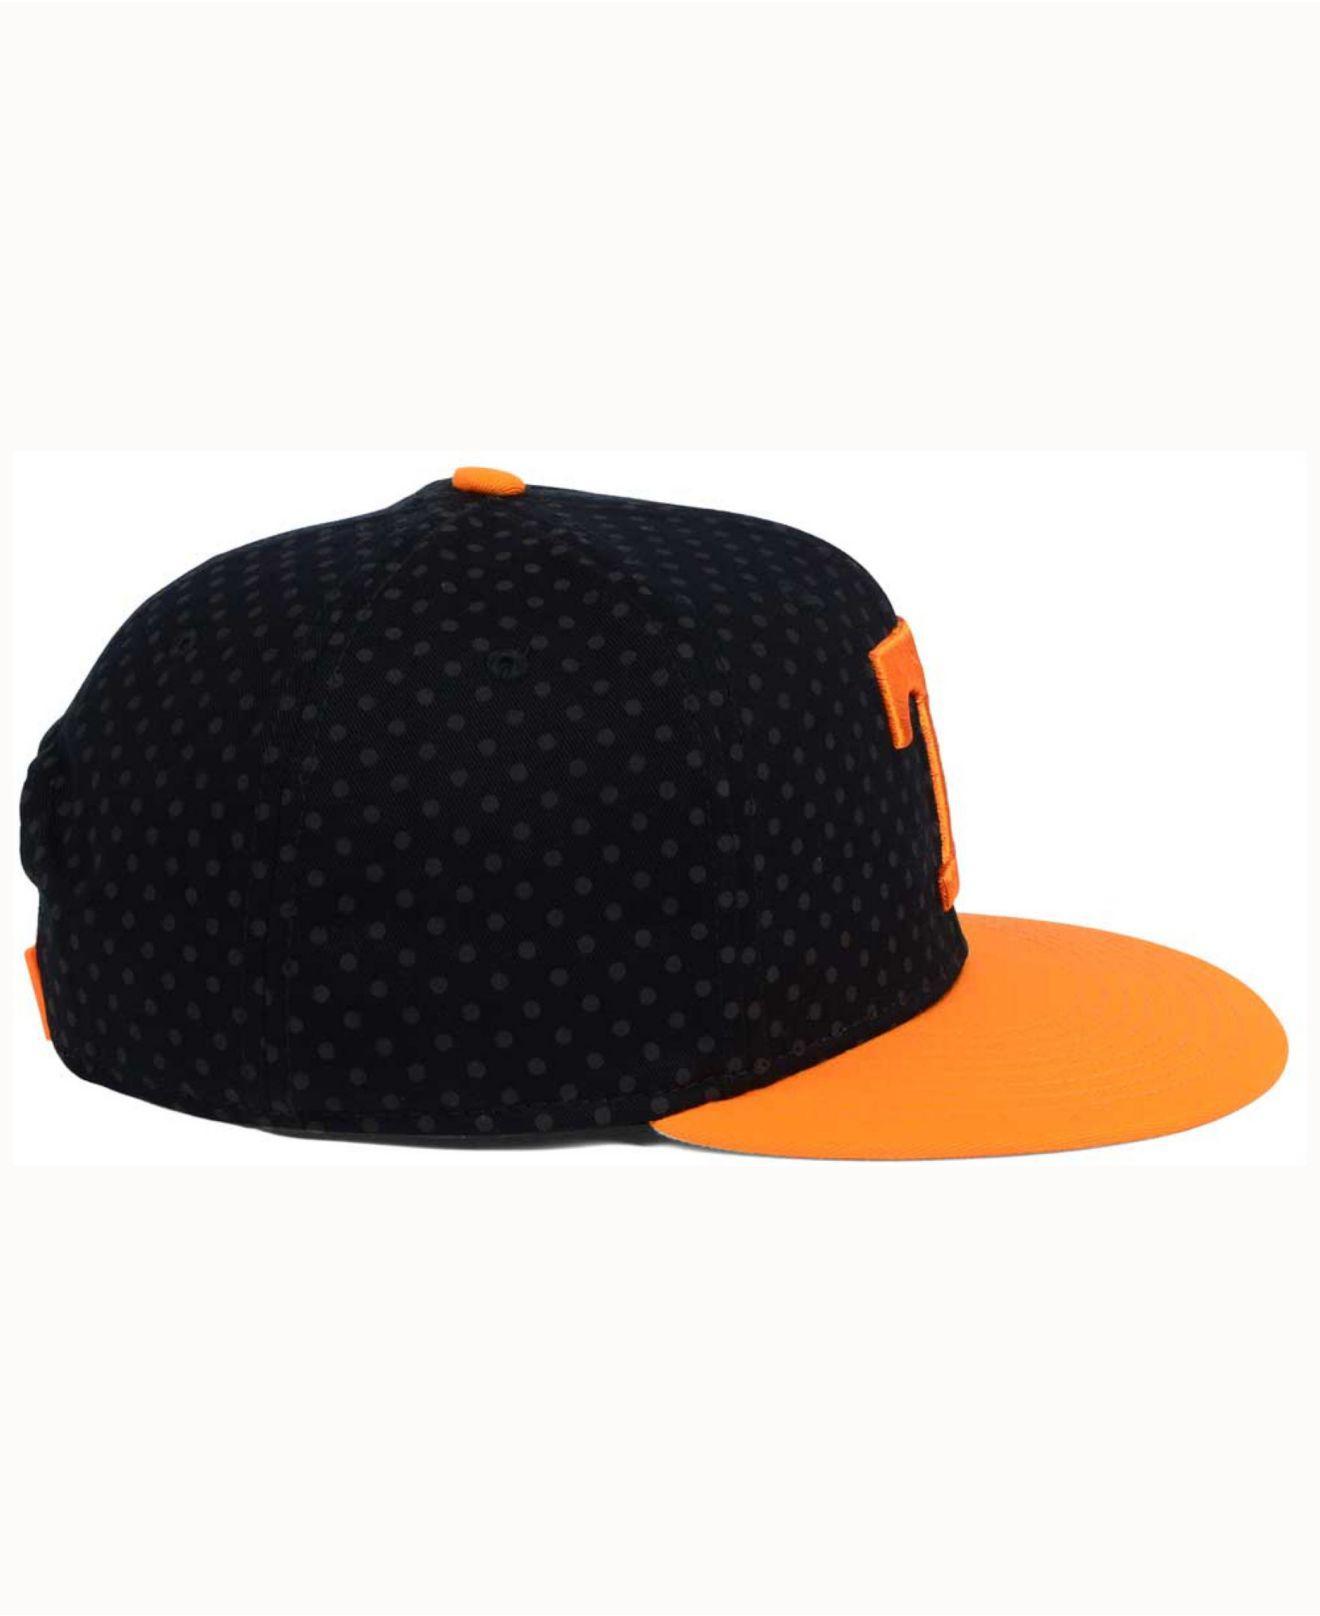 Nike - Black Local Dna Seasonal True Snapback Cap for Men - Lyst. View  fullscreen 3247a198c862